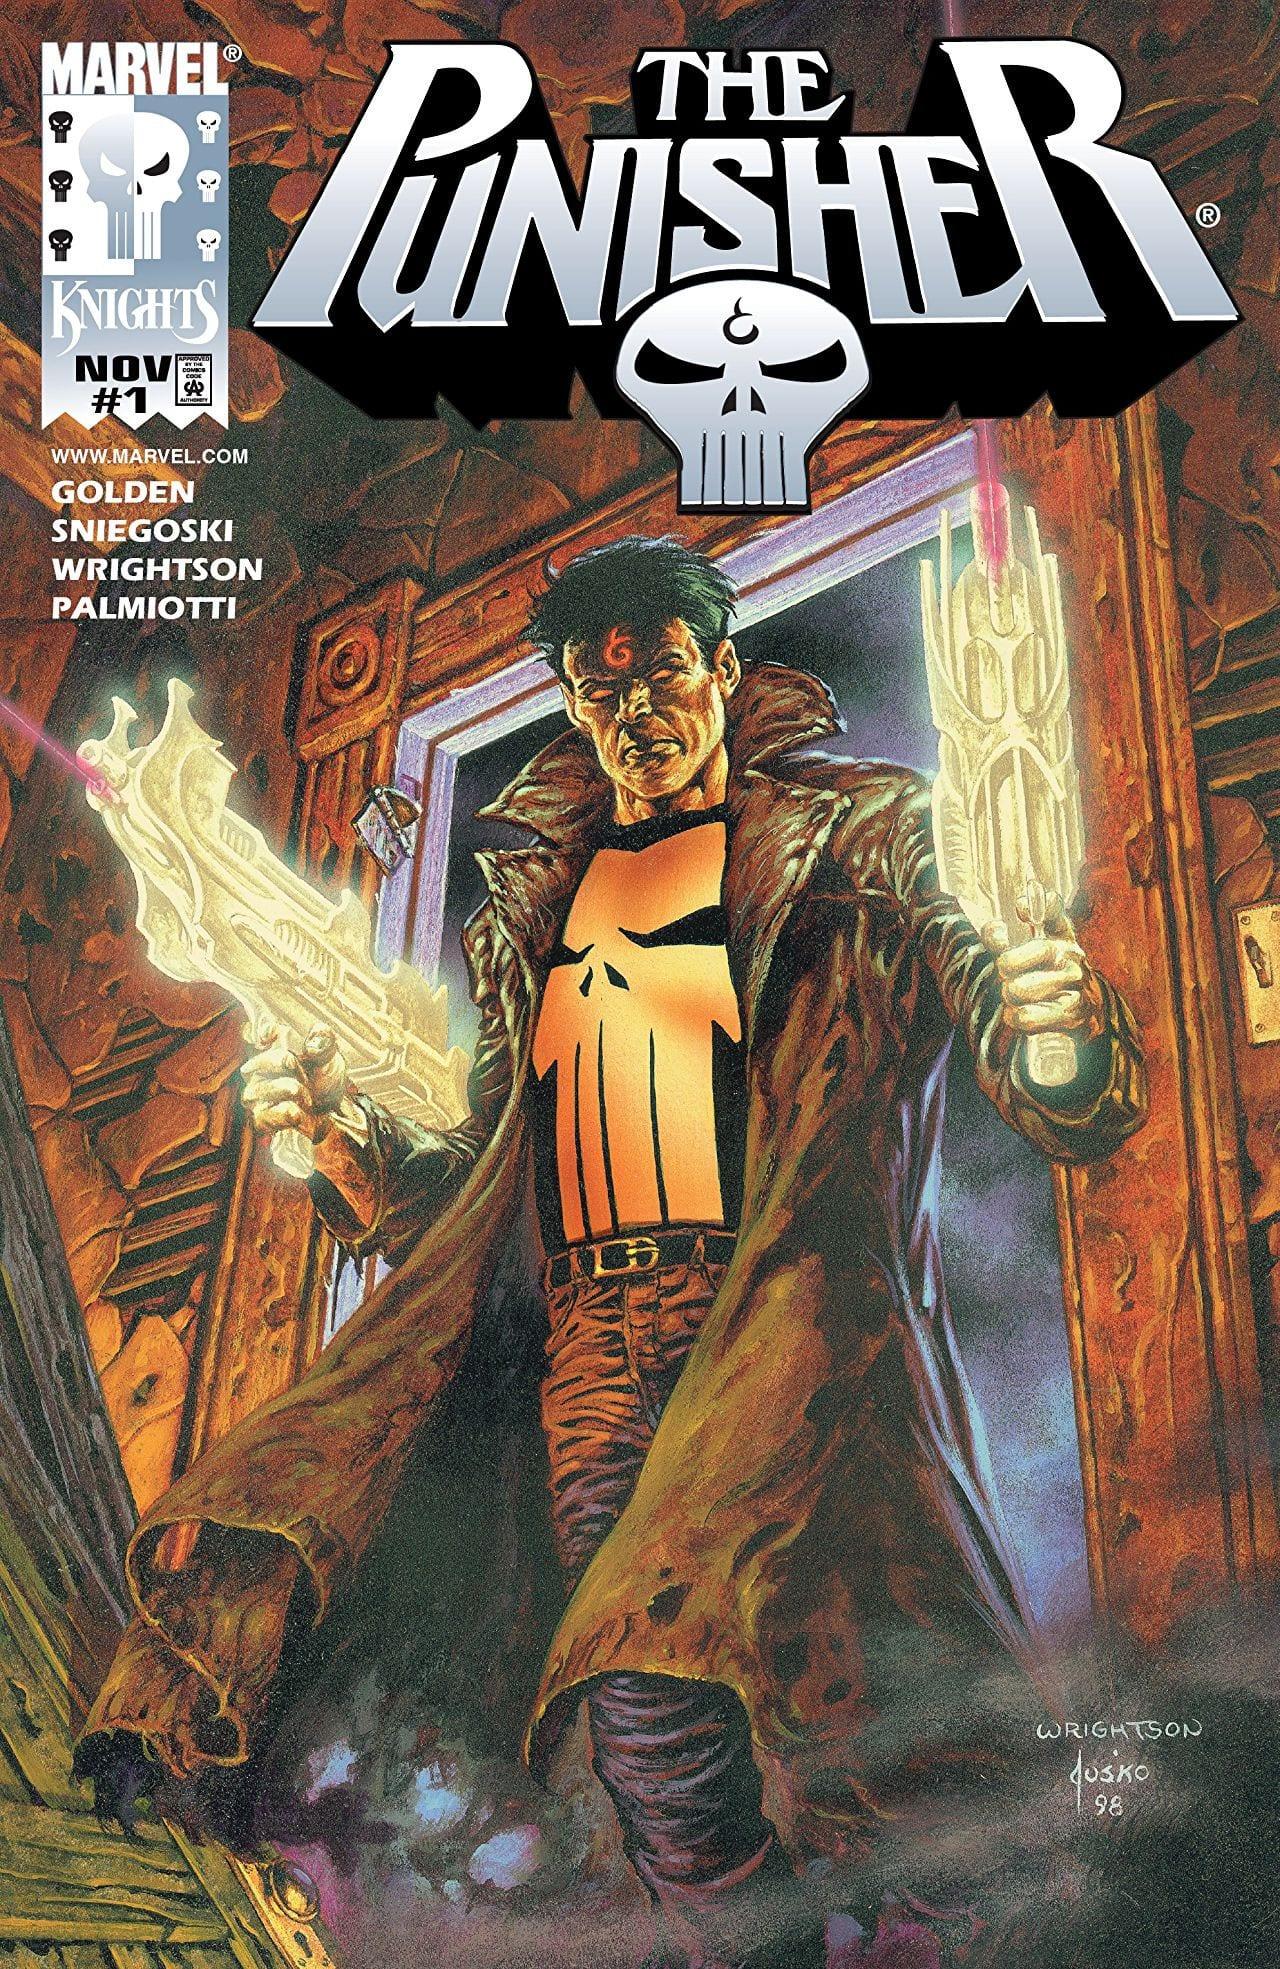 Comic completo Punisher Volumen 4